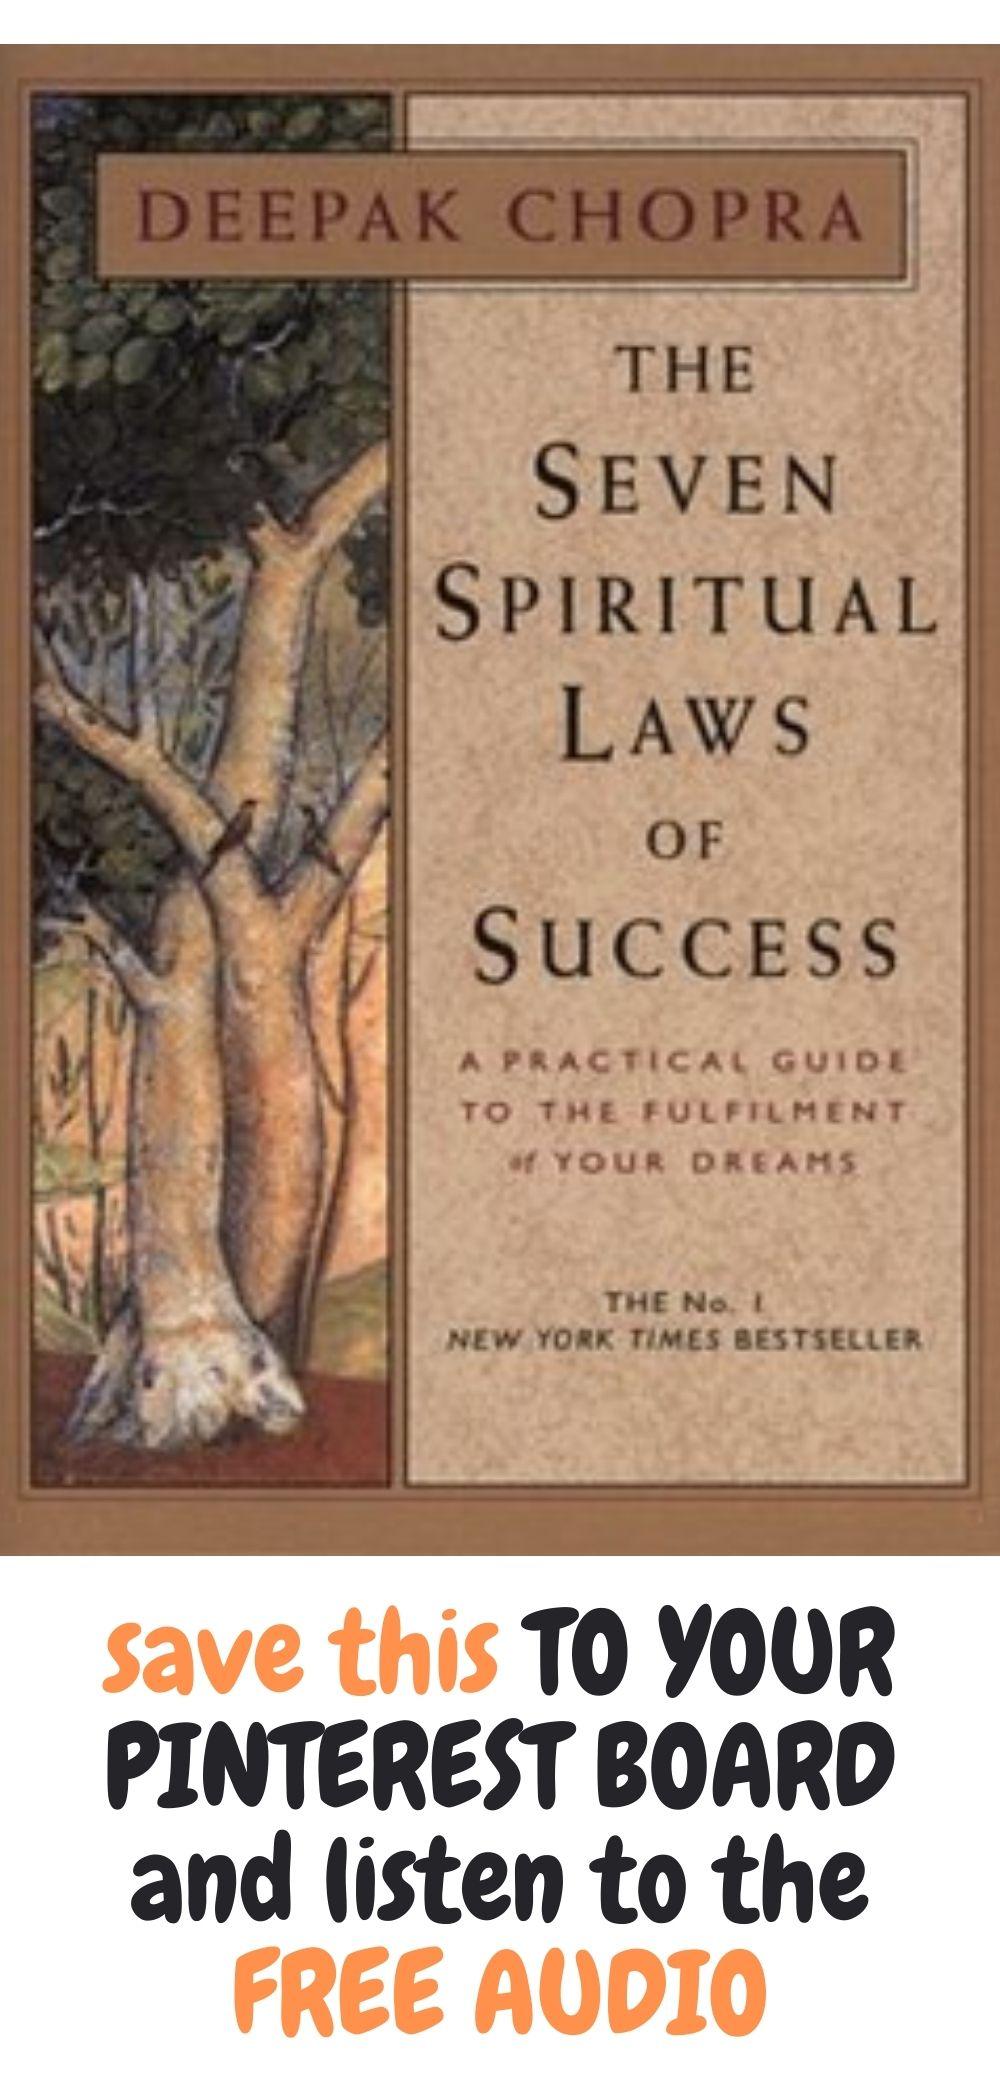 free audio books deepak chopra the seven spiritual laws of success